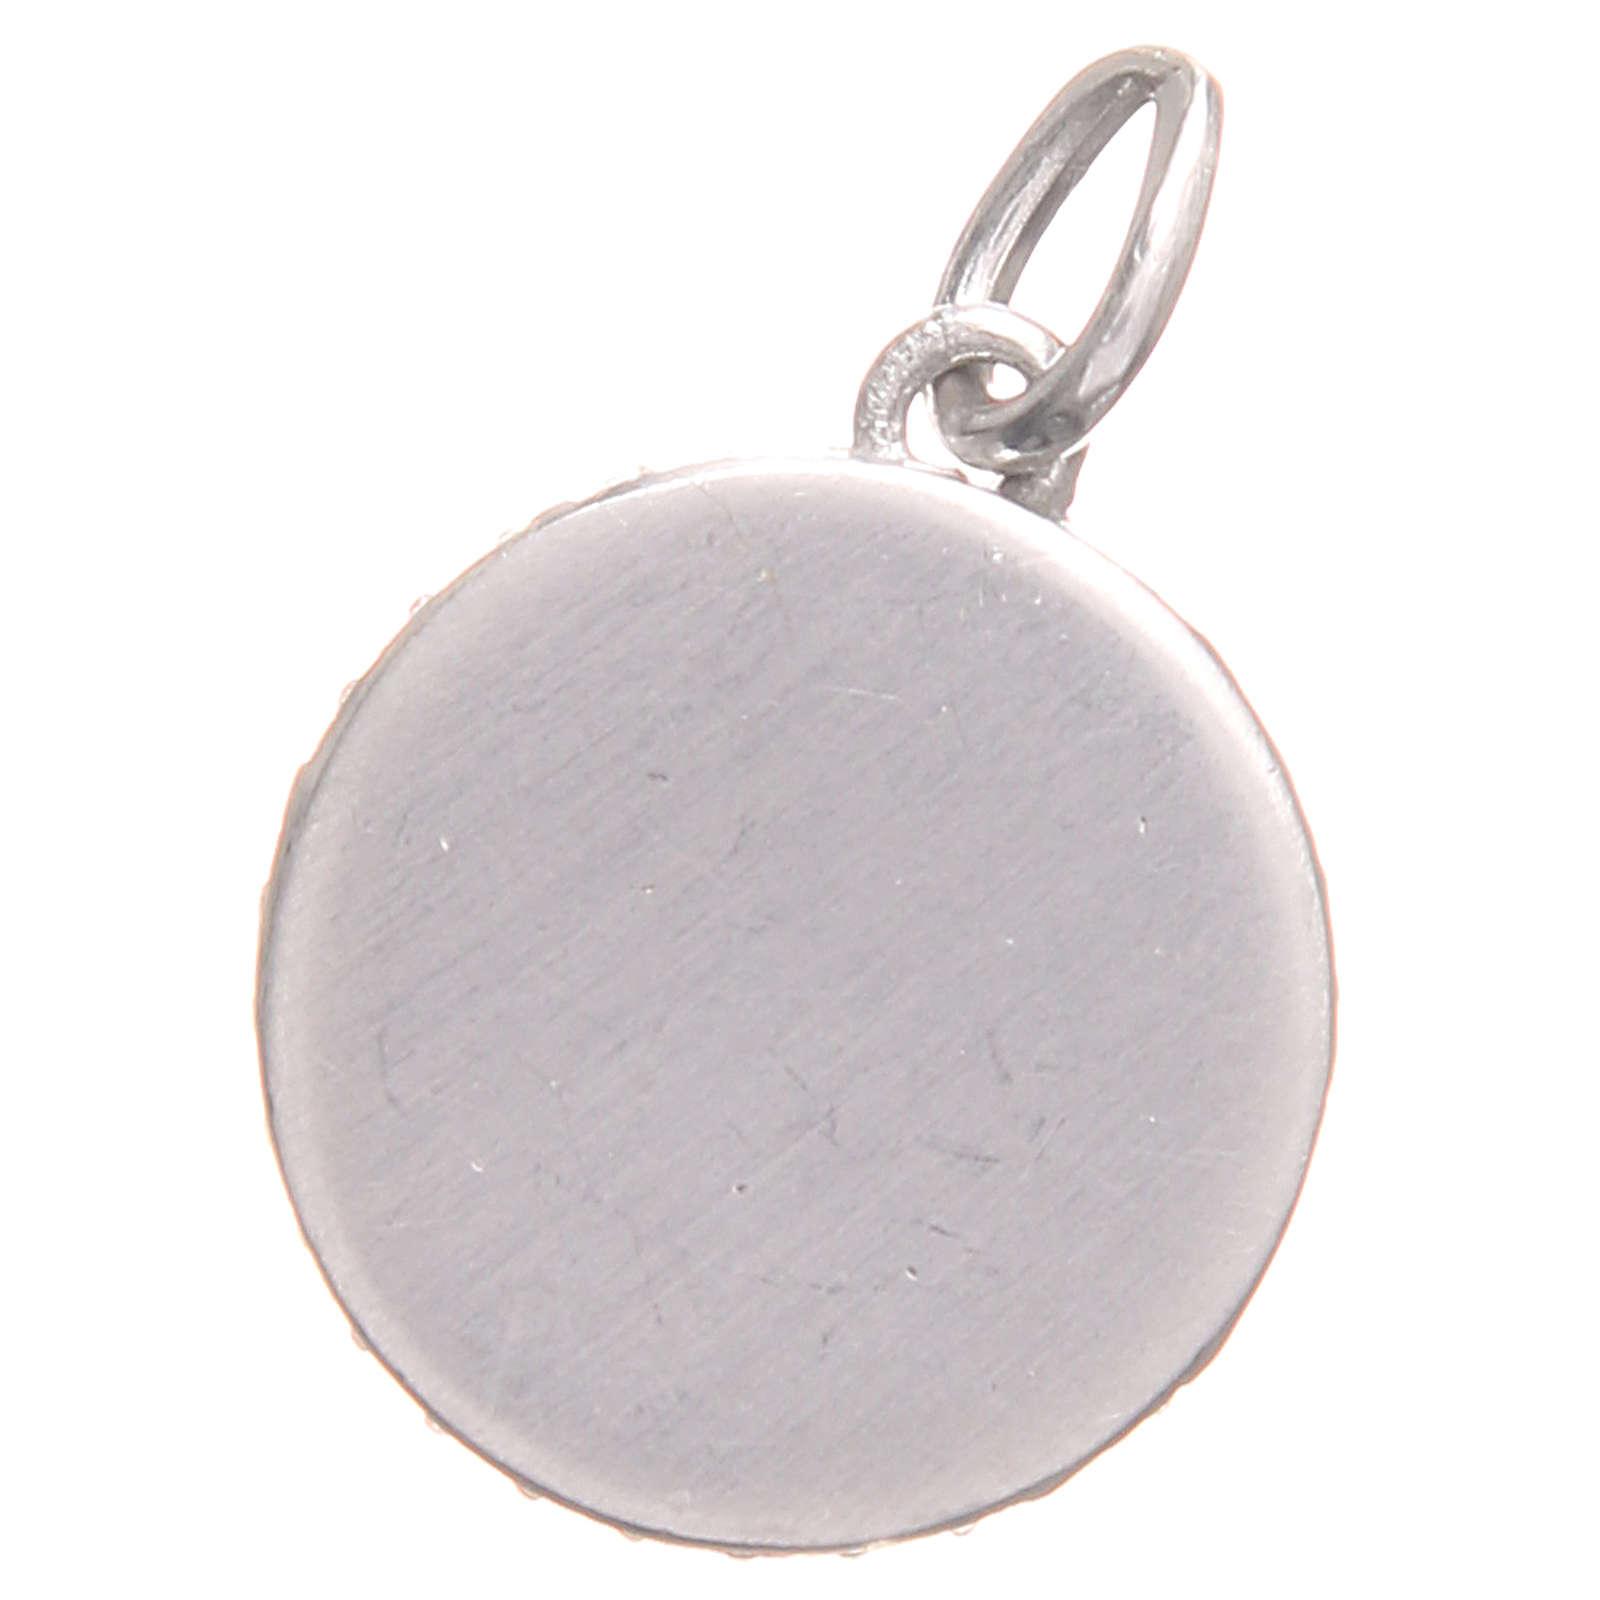 Pendant charm in 800 silver with Saint Benedict Cross 1.7x1.7cm 4